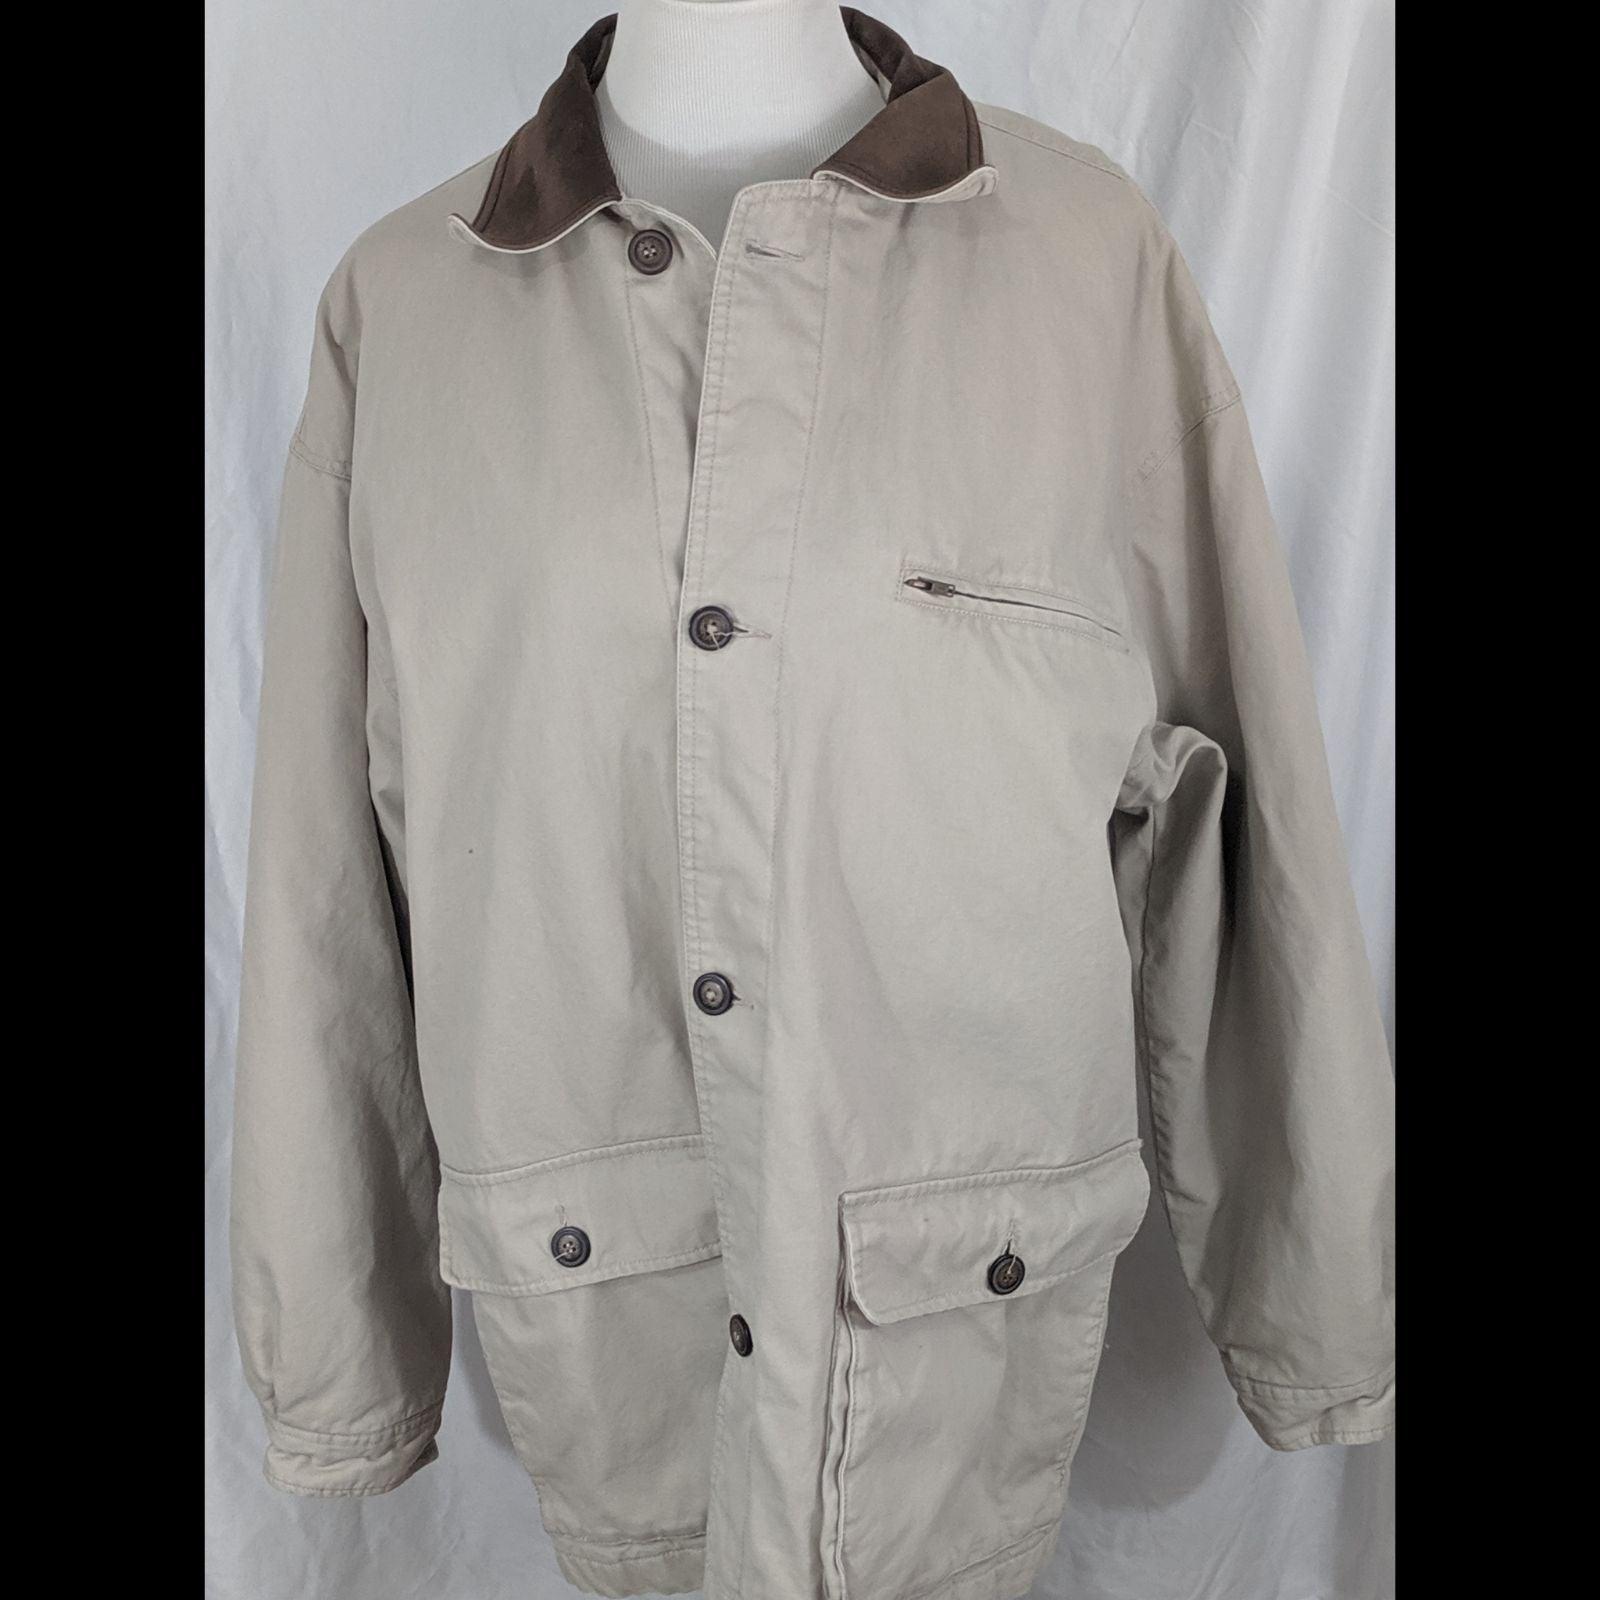 Geoffrey Beene Tan Coat Size Large